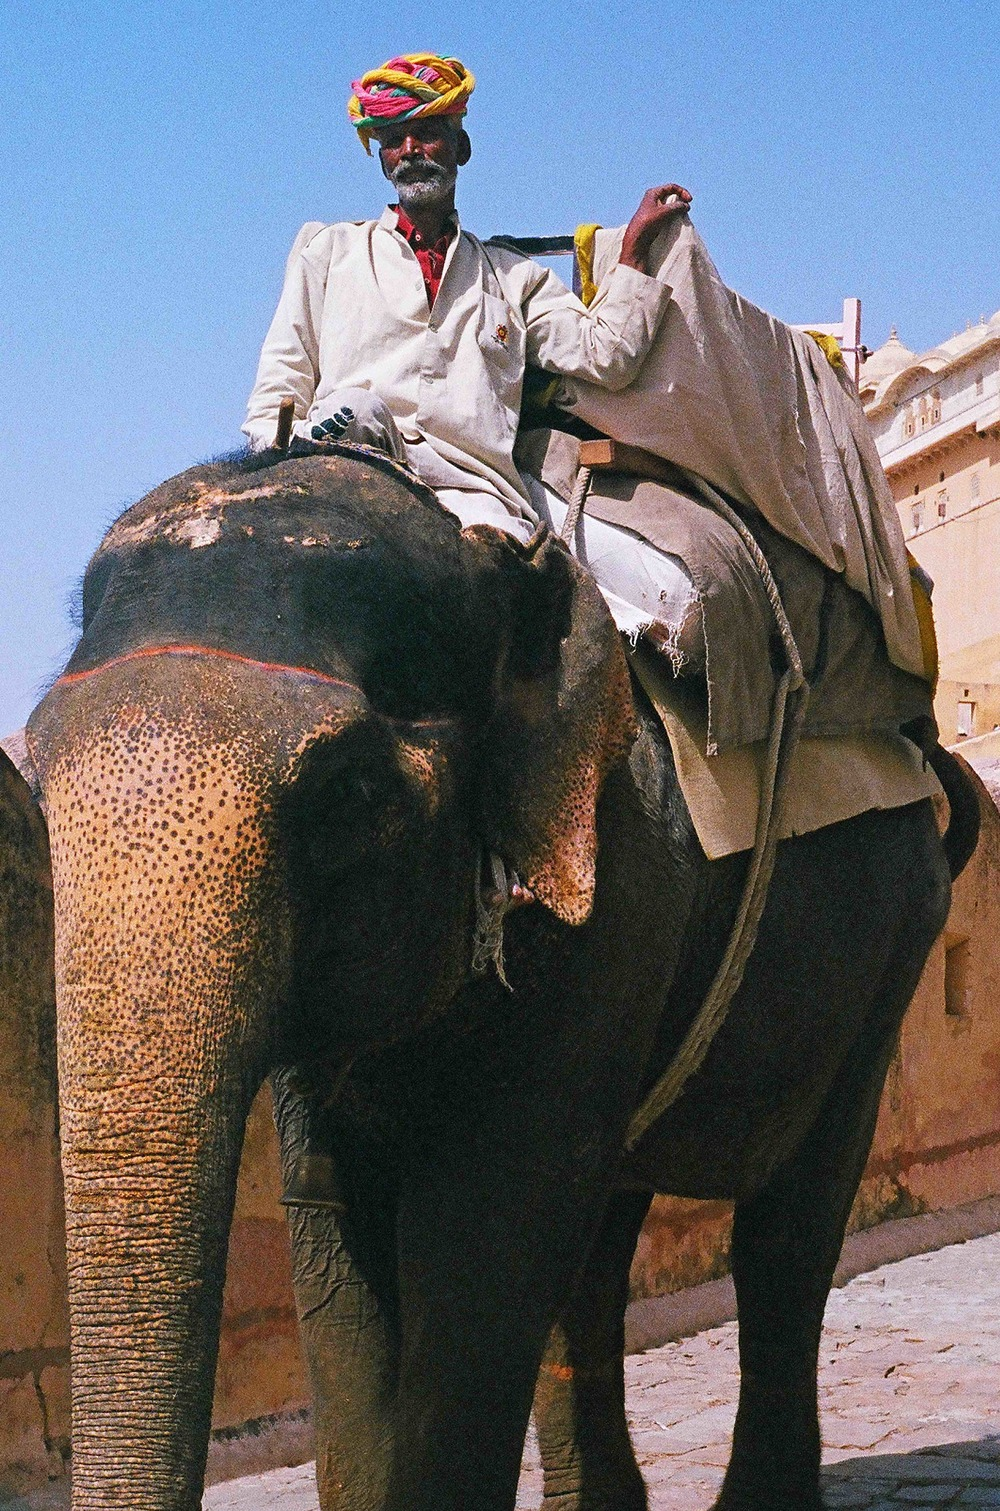 elephant11.5x17.375.jpg